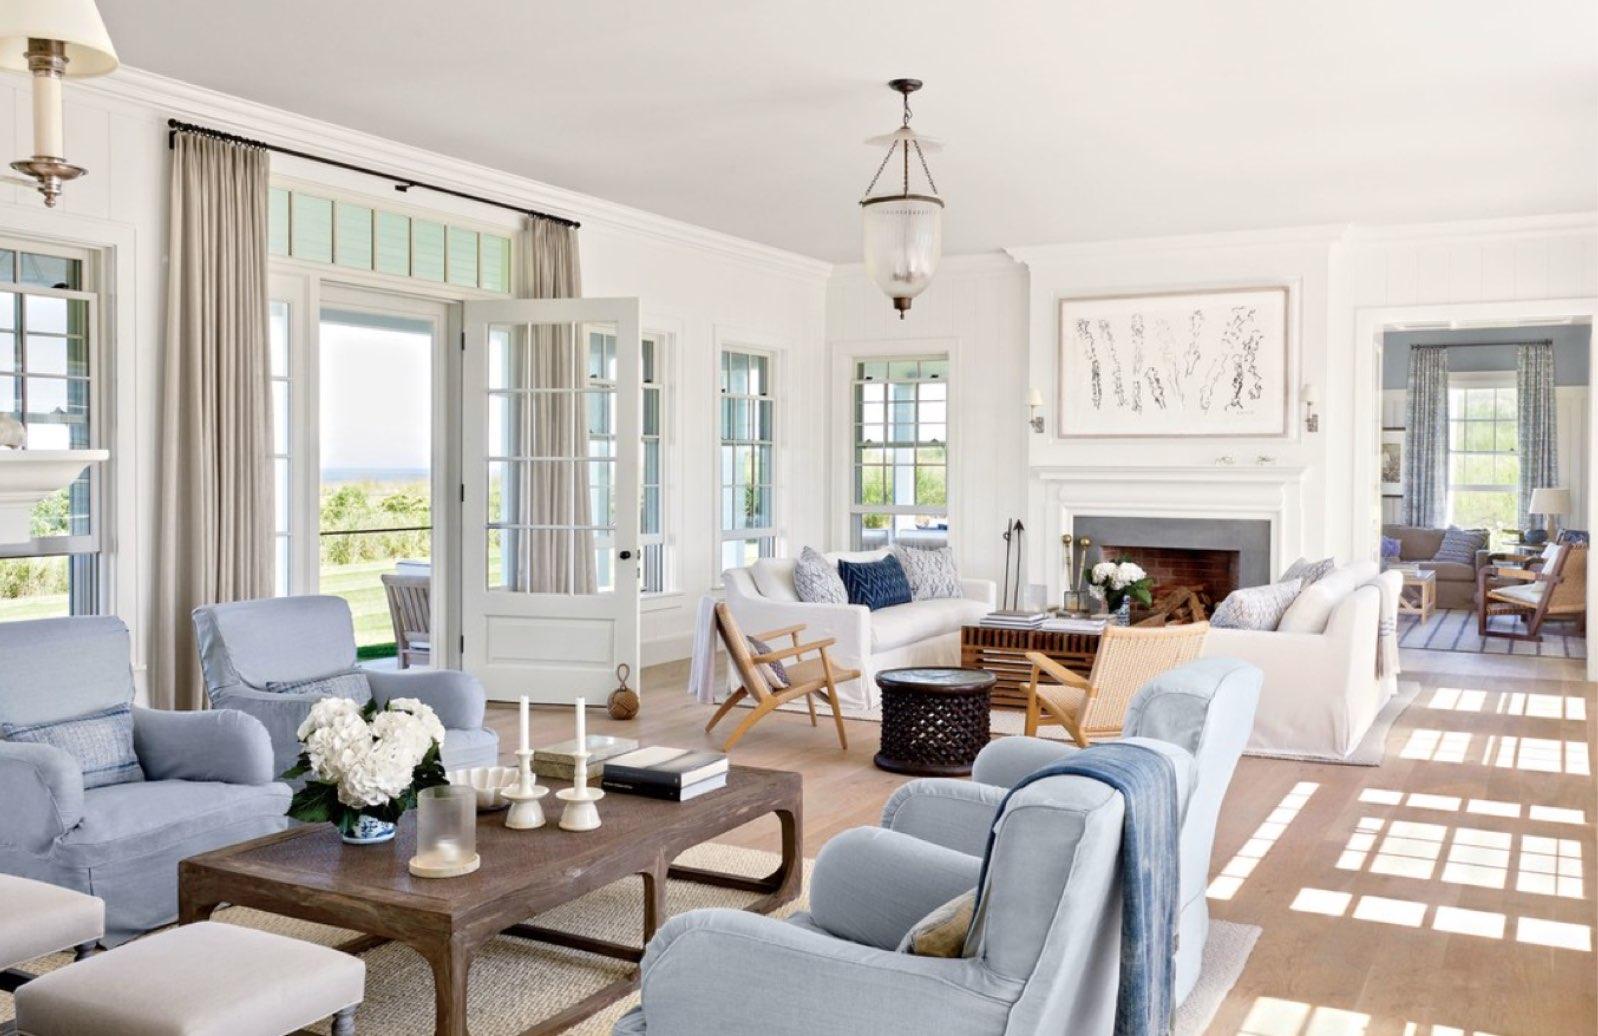 Victoria Hagen's Classic Nantucket Home Photos | Architectural Digest-3.jpg